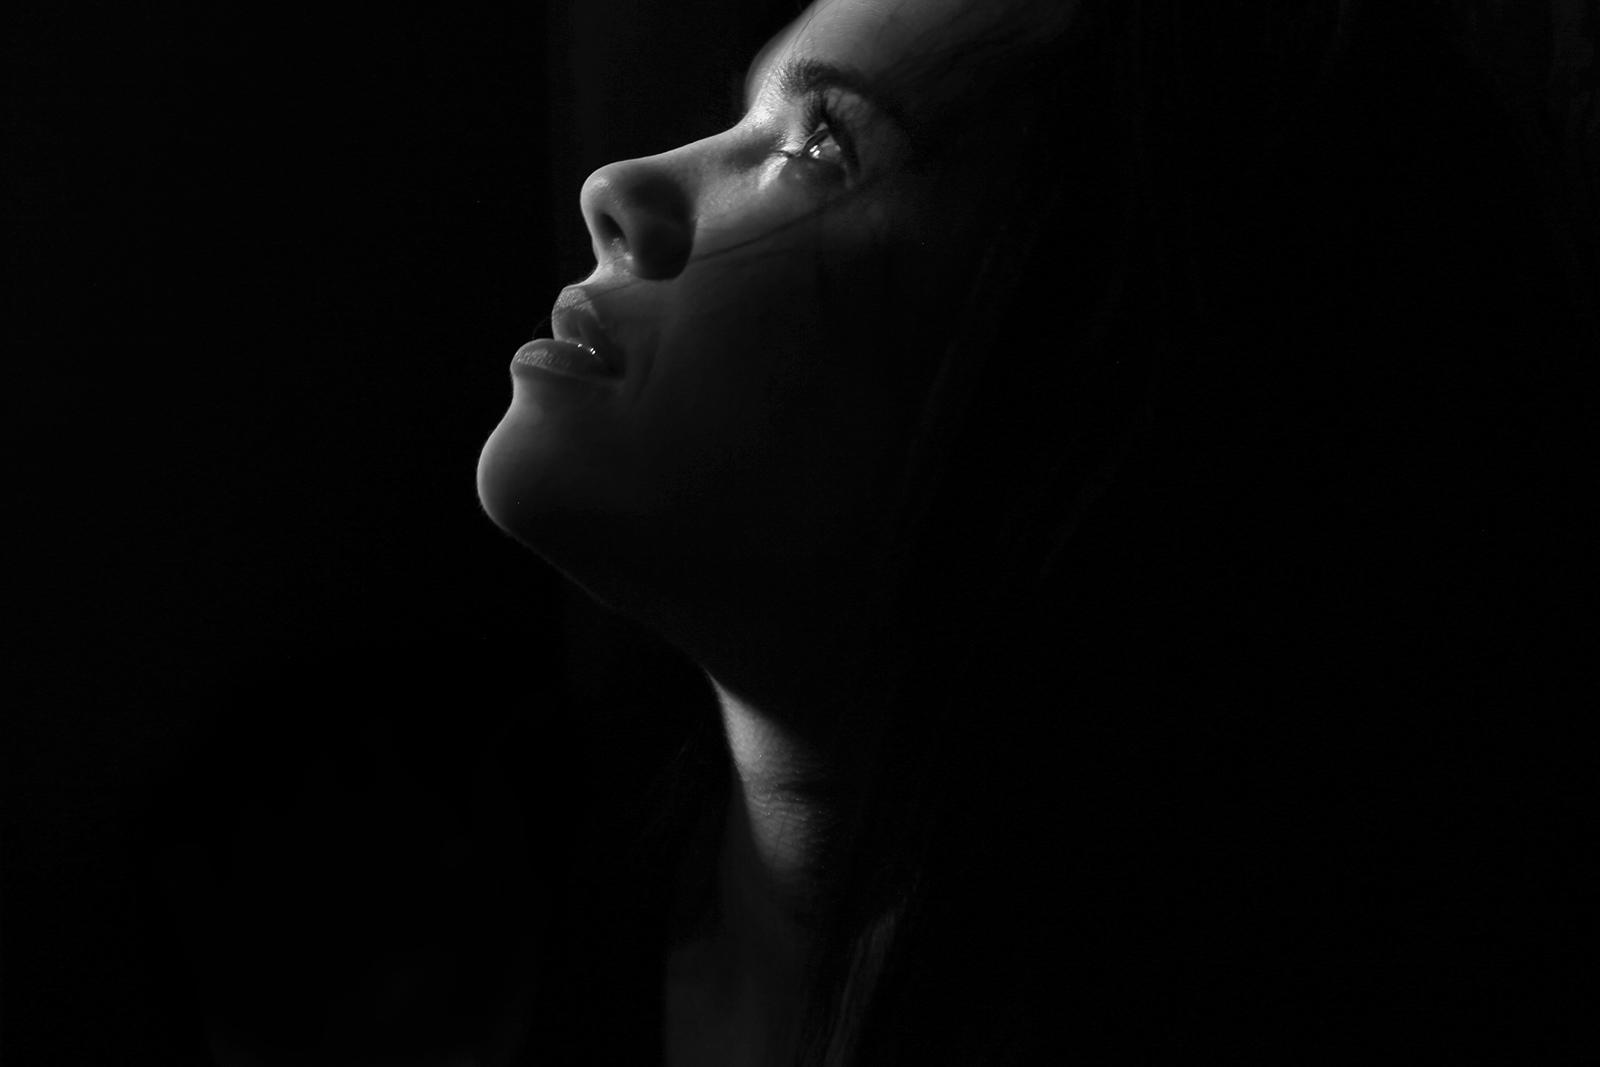 Jodi Swanson, Braving the Light